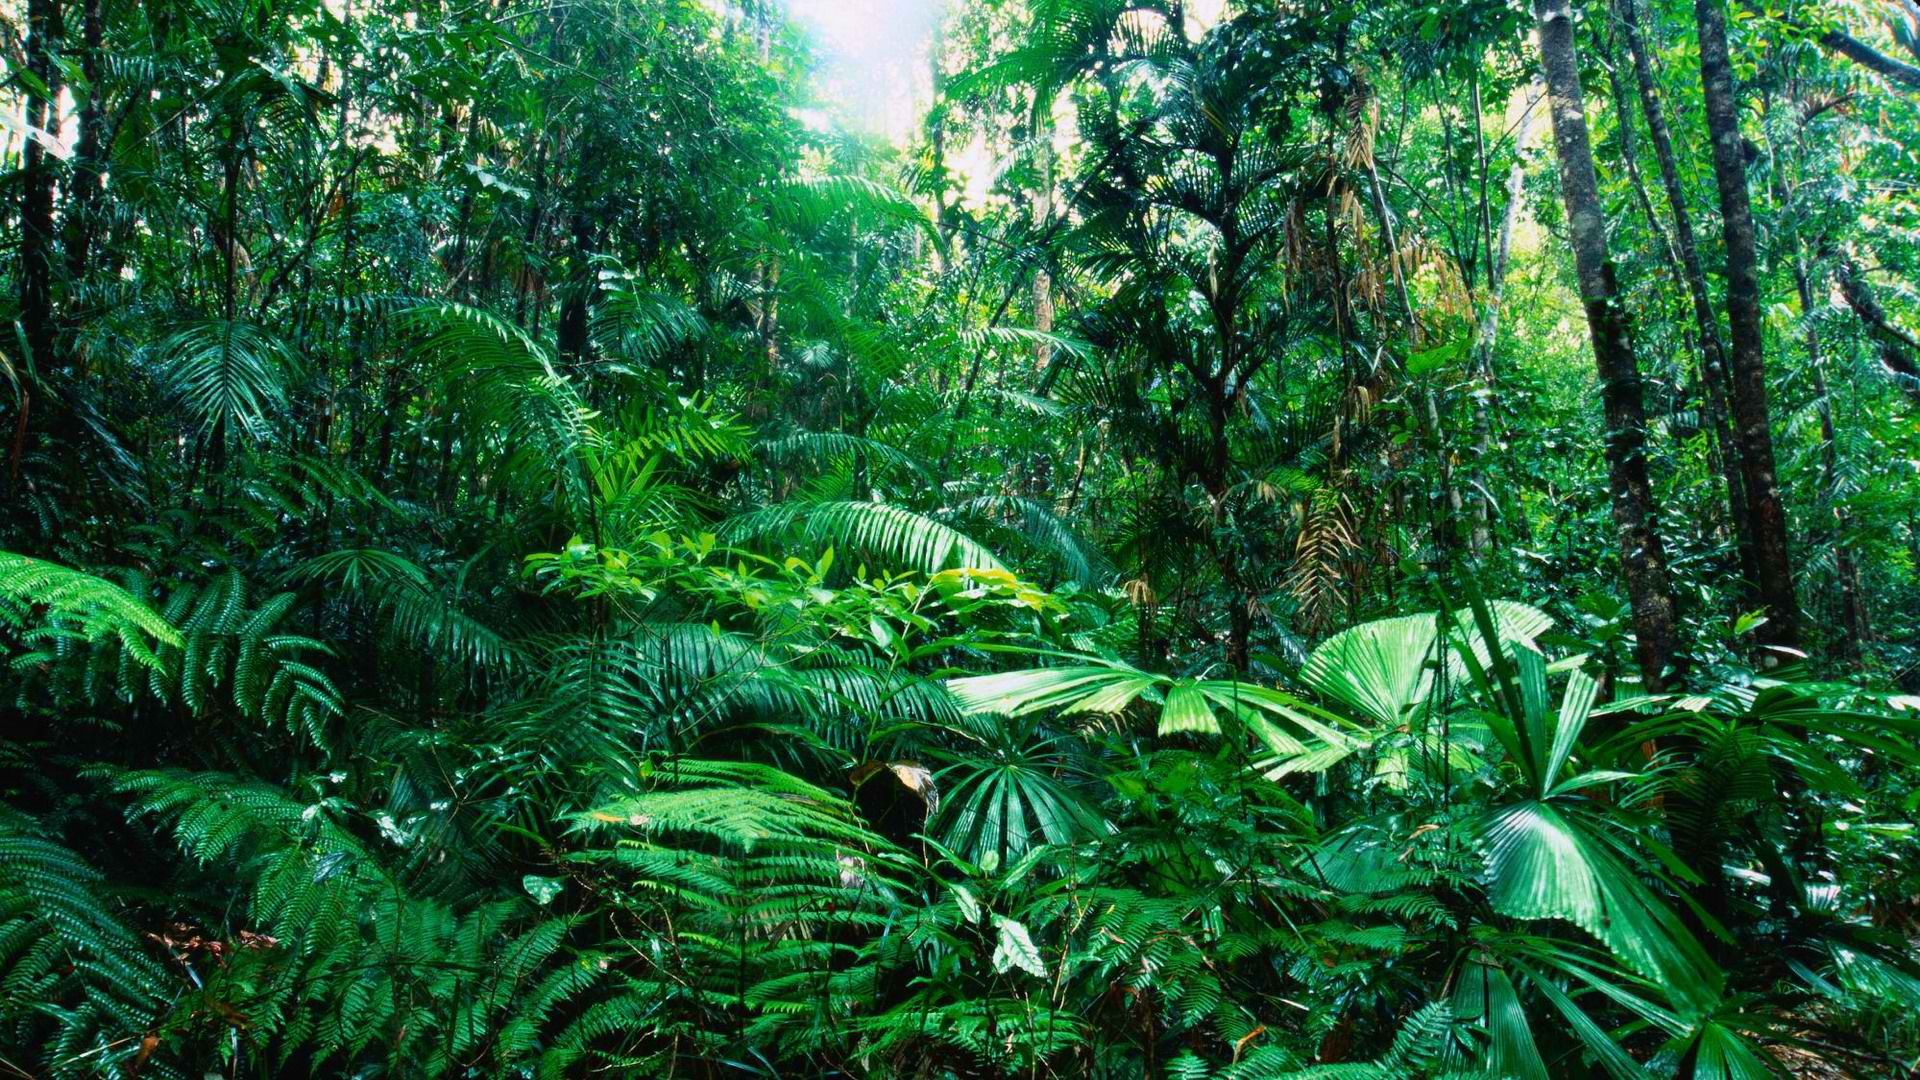 Tropical australia rainforest wallpaper 1920x1080 for Australian rainforest